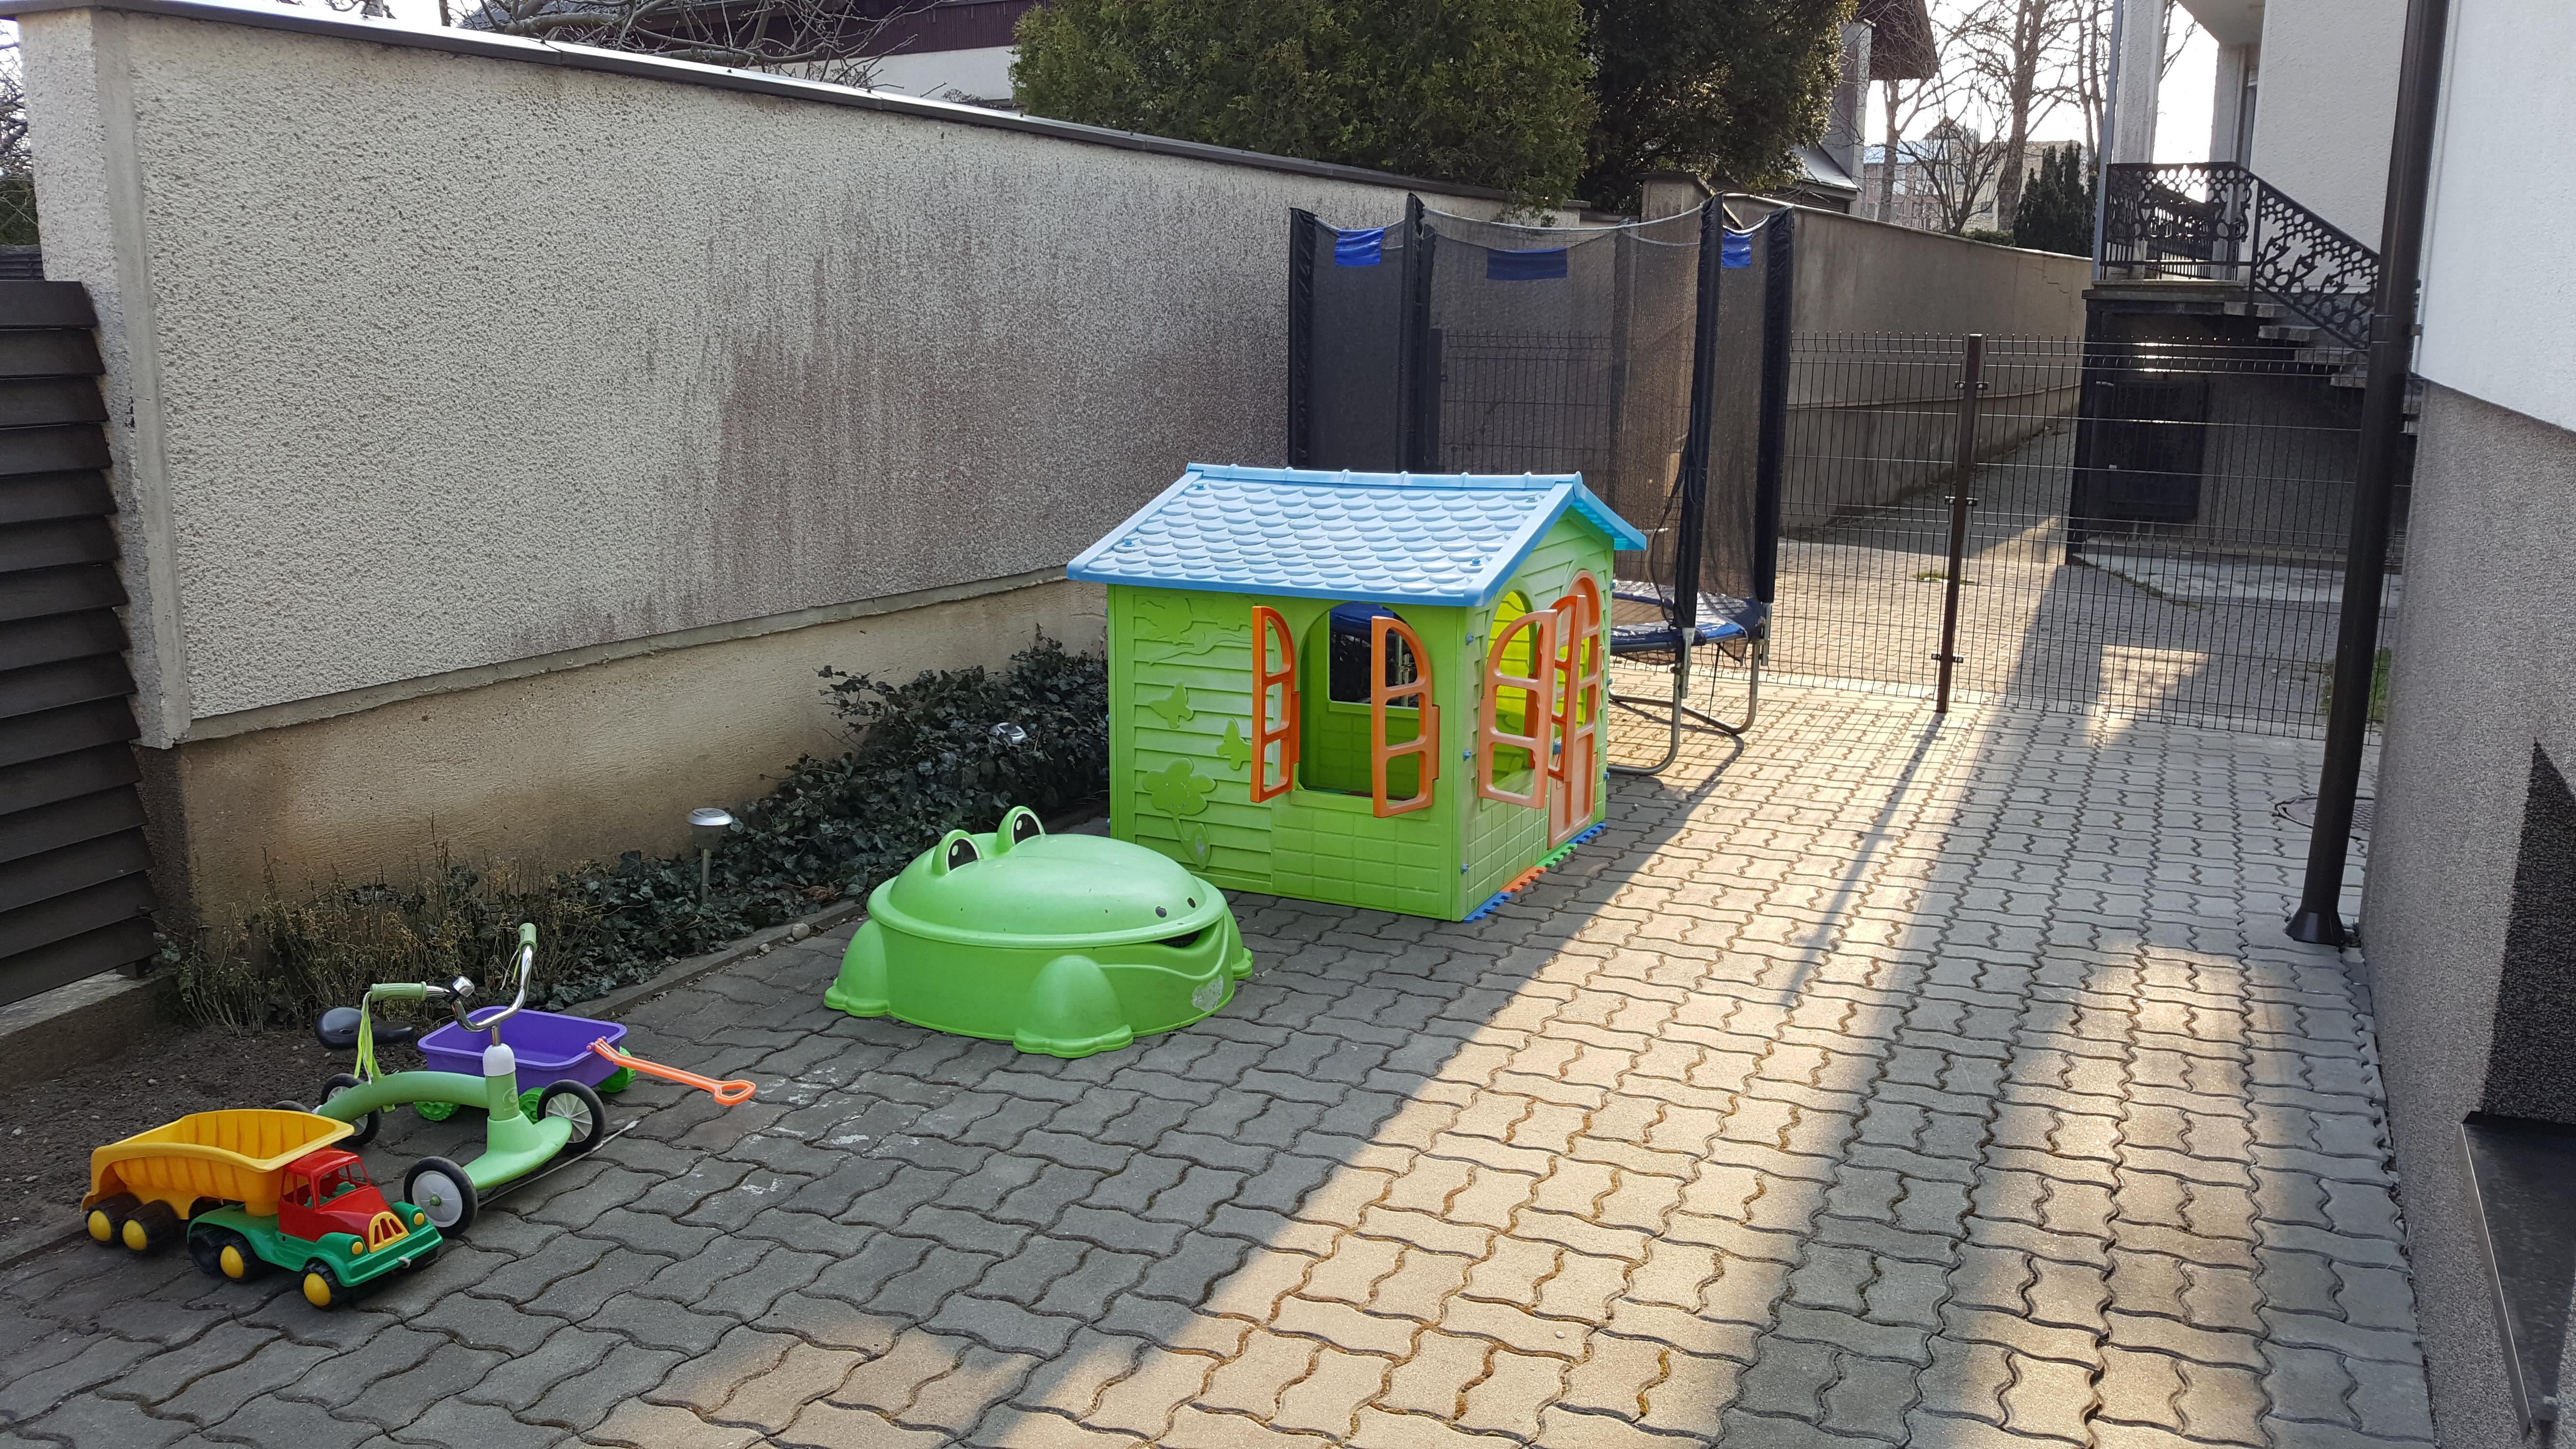 Vaikų žaidimo erdvė / children's play area/  / детская игровая площадка